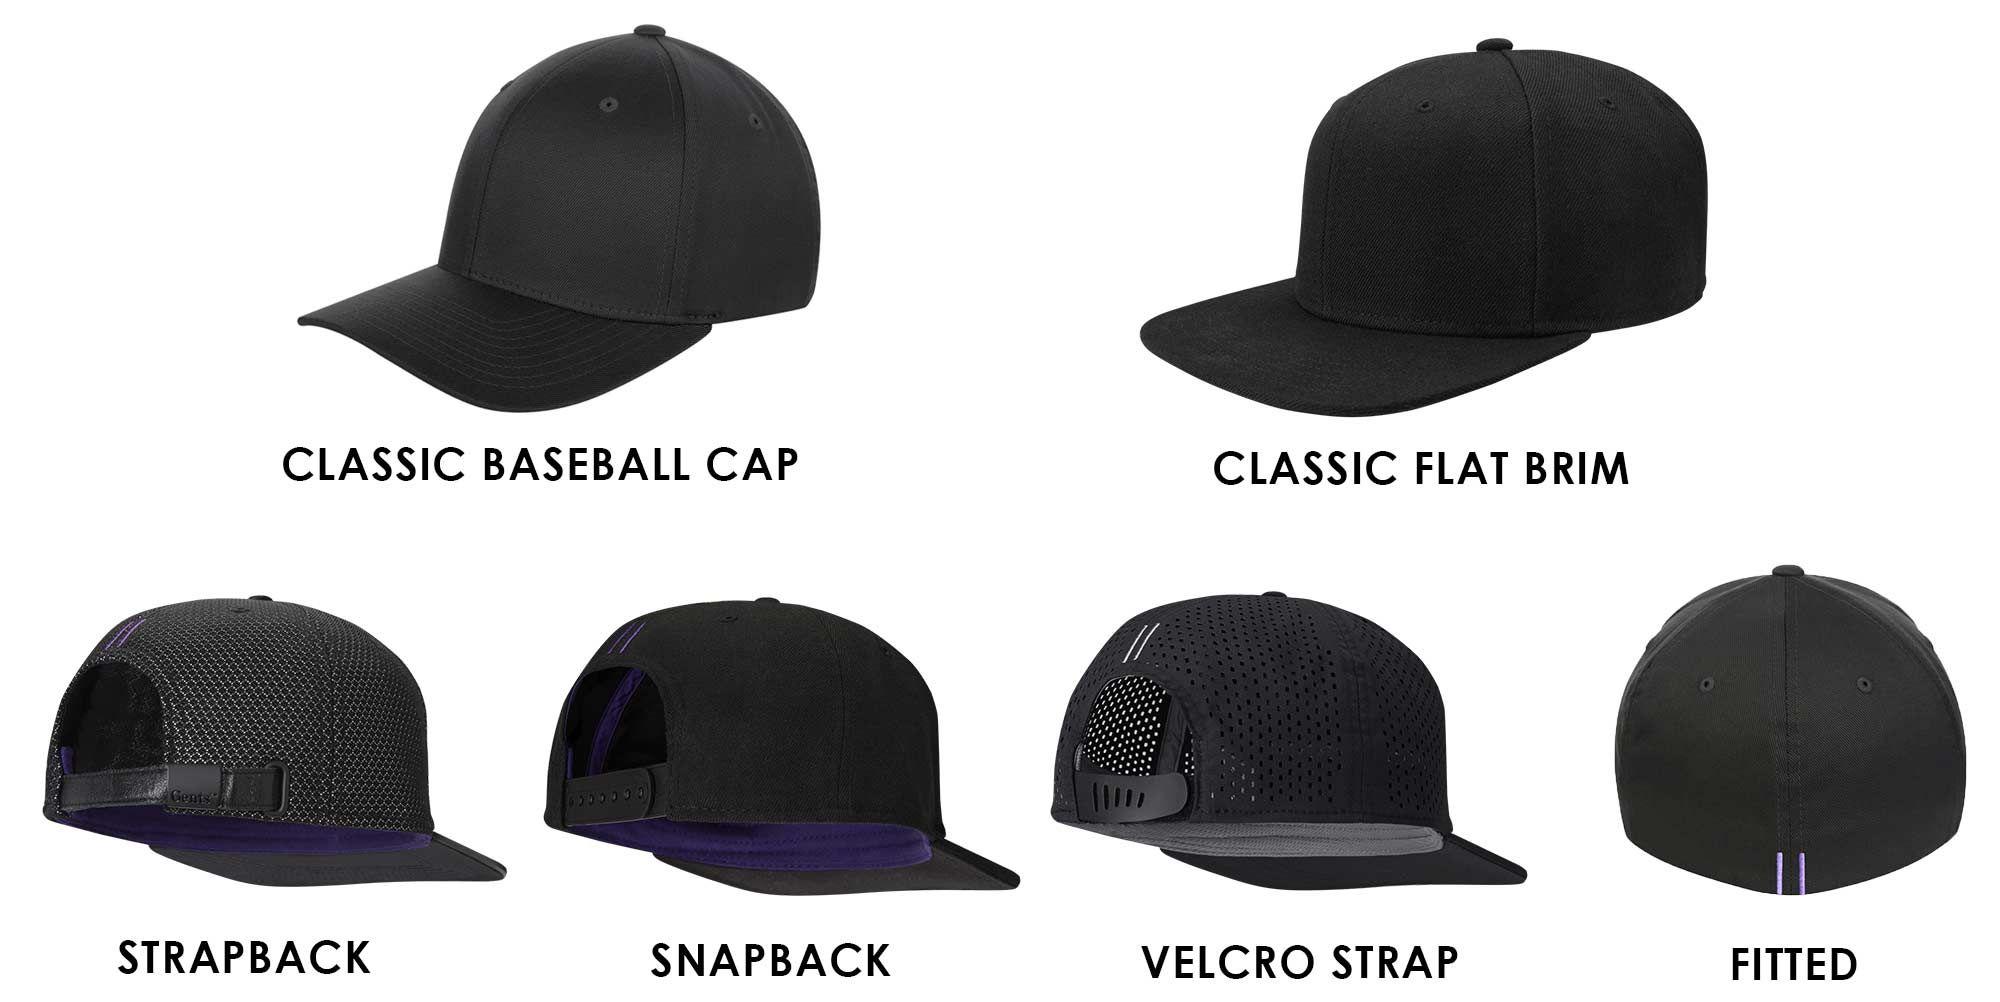 dafba3329ae1e Style Guide Flat Brim Hat